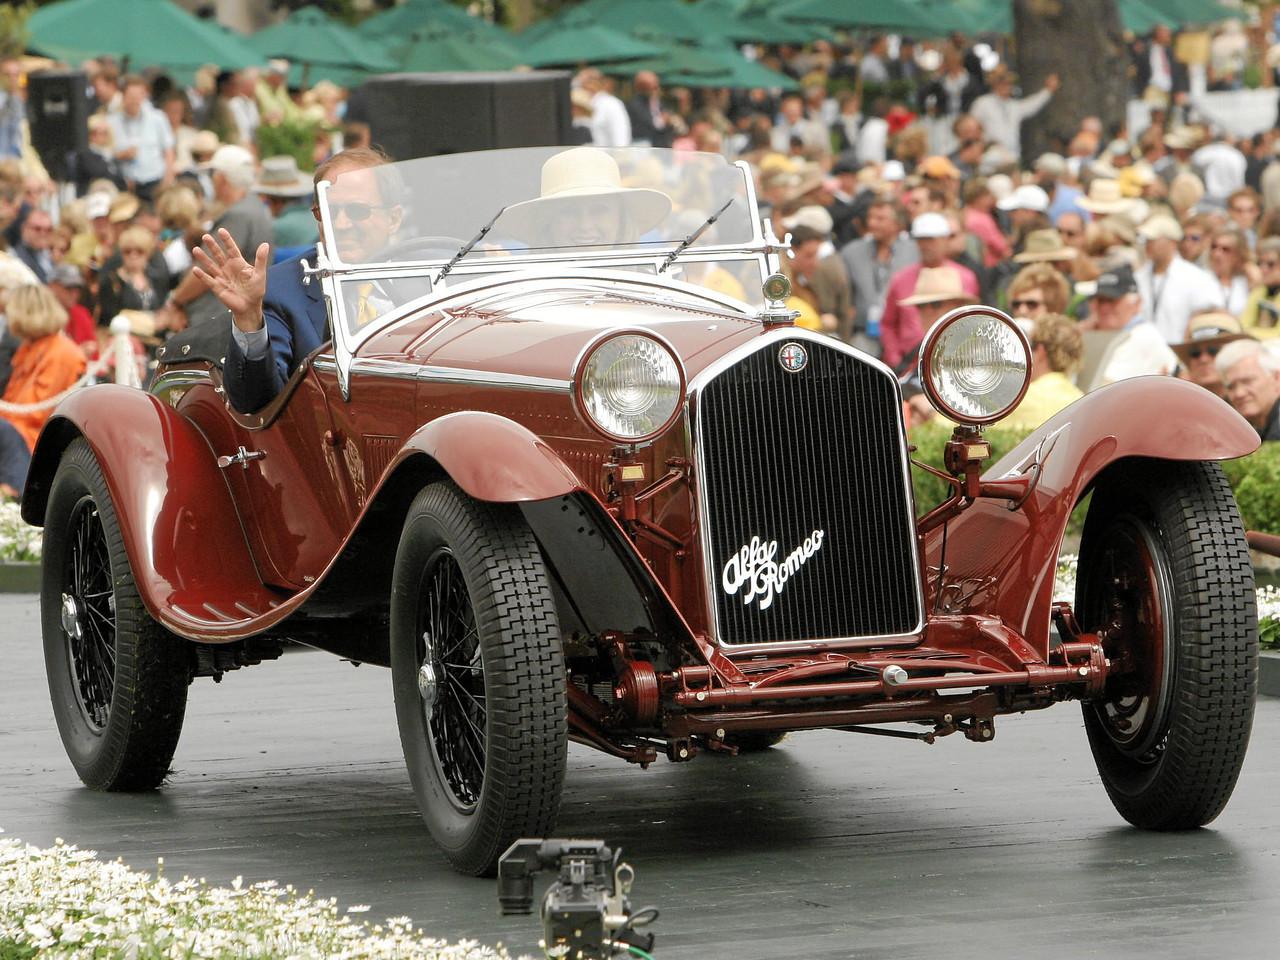 1932 Alfa Romeo 8C 2300 Zagato Spyder owned by David and Ginny Sydorick from Beverly Hills 2nd Class E-4  (Alfa Romeo 8C 2300)